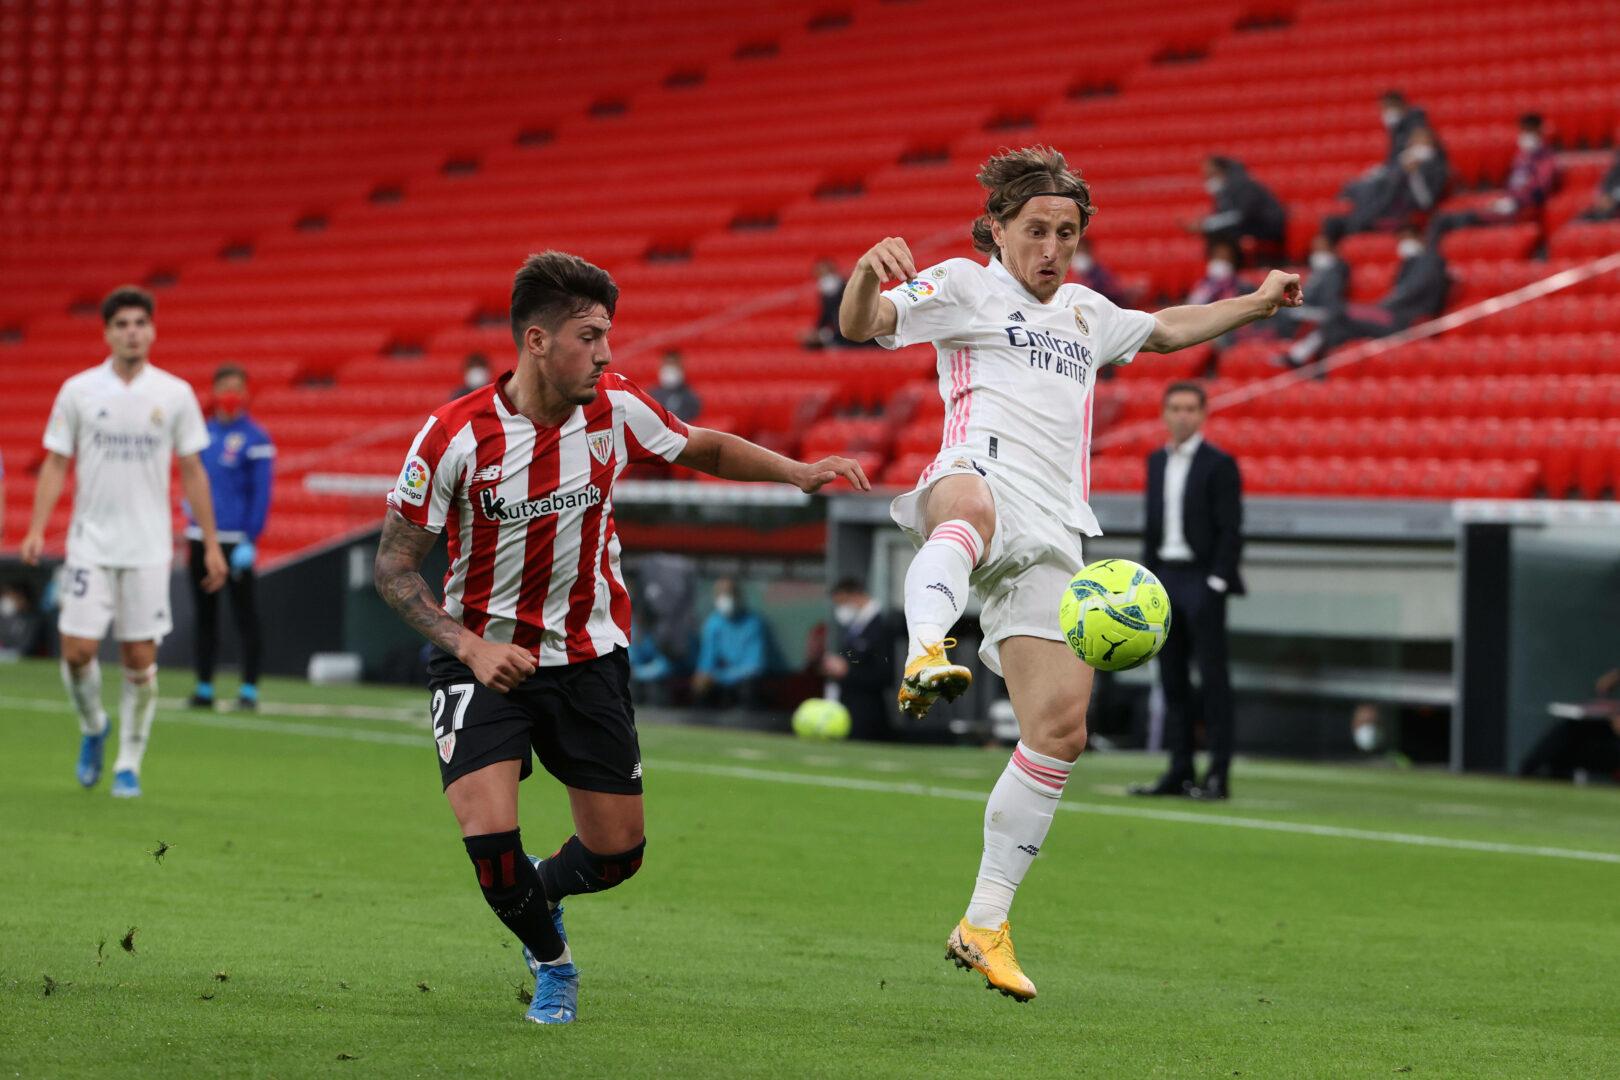 La Liga Vorschau Teil 4: Real Madrid, Athletic, Levante, RCD Mallorca